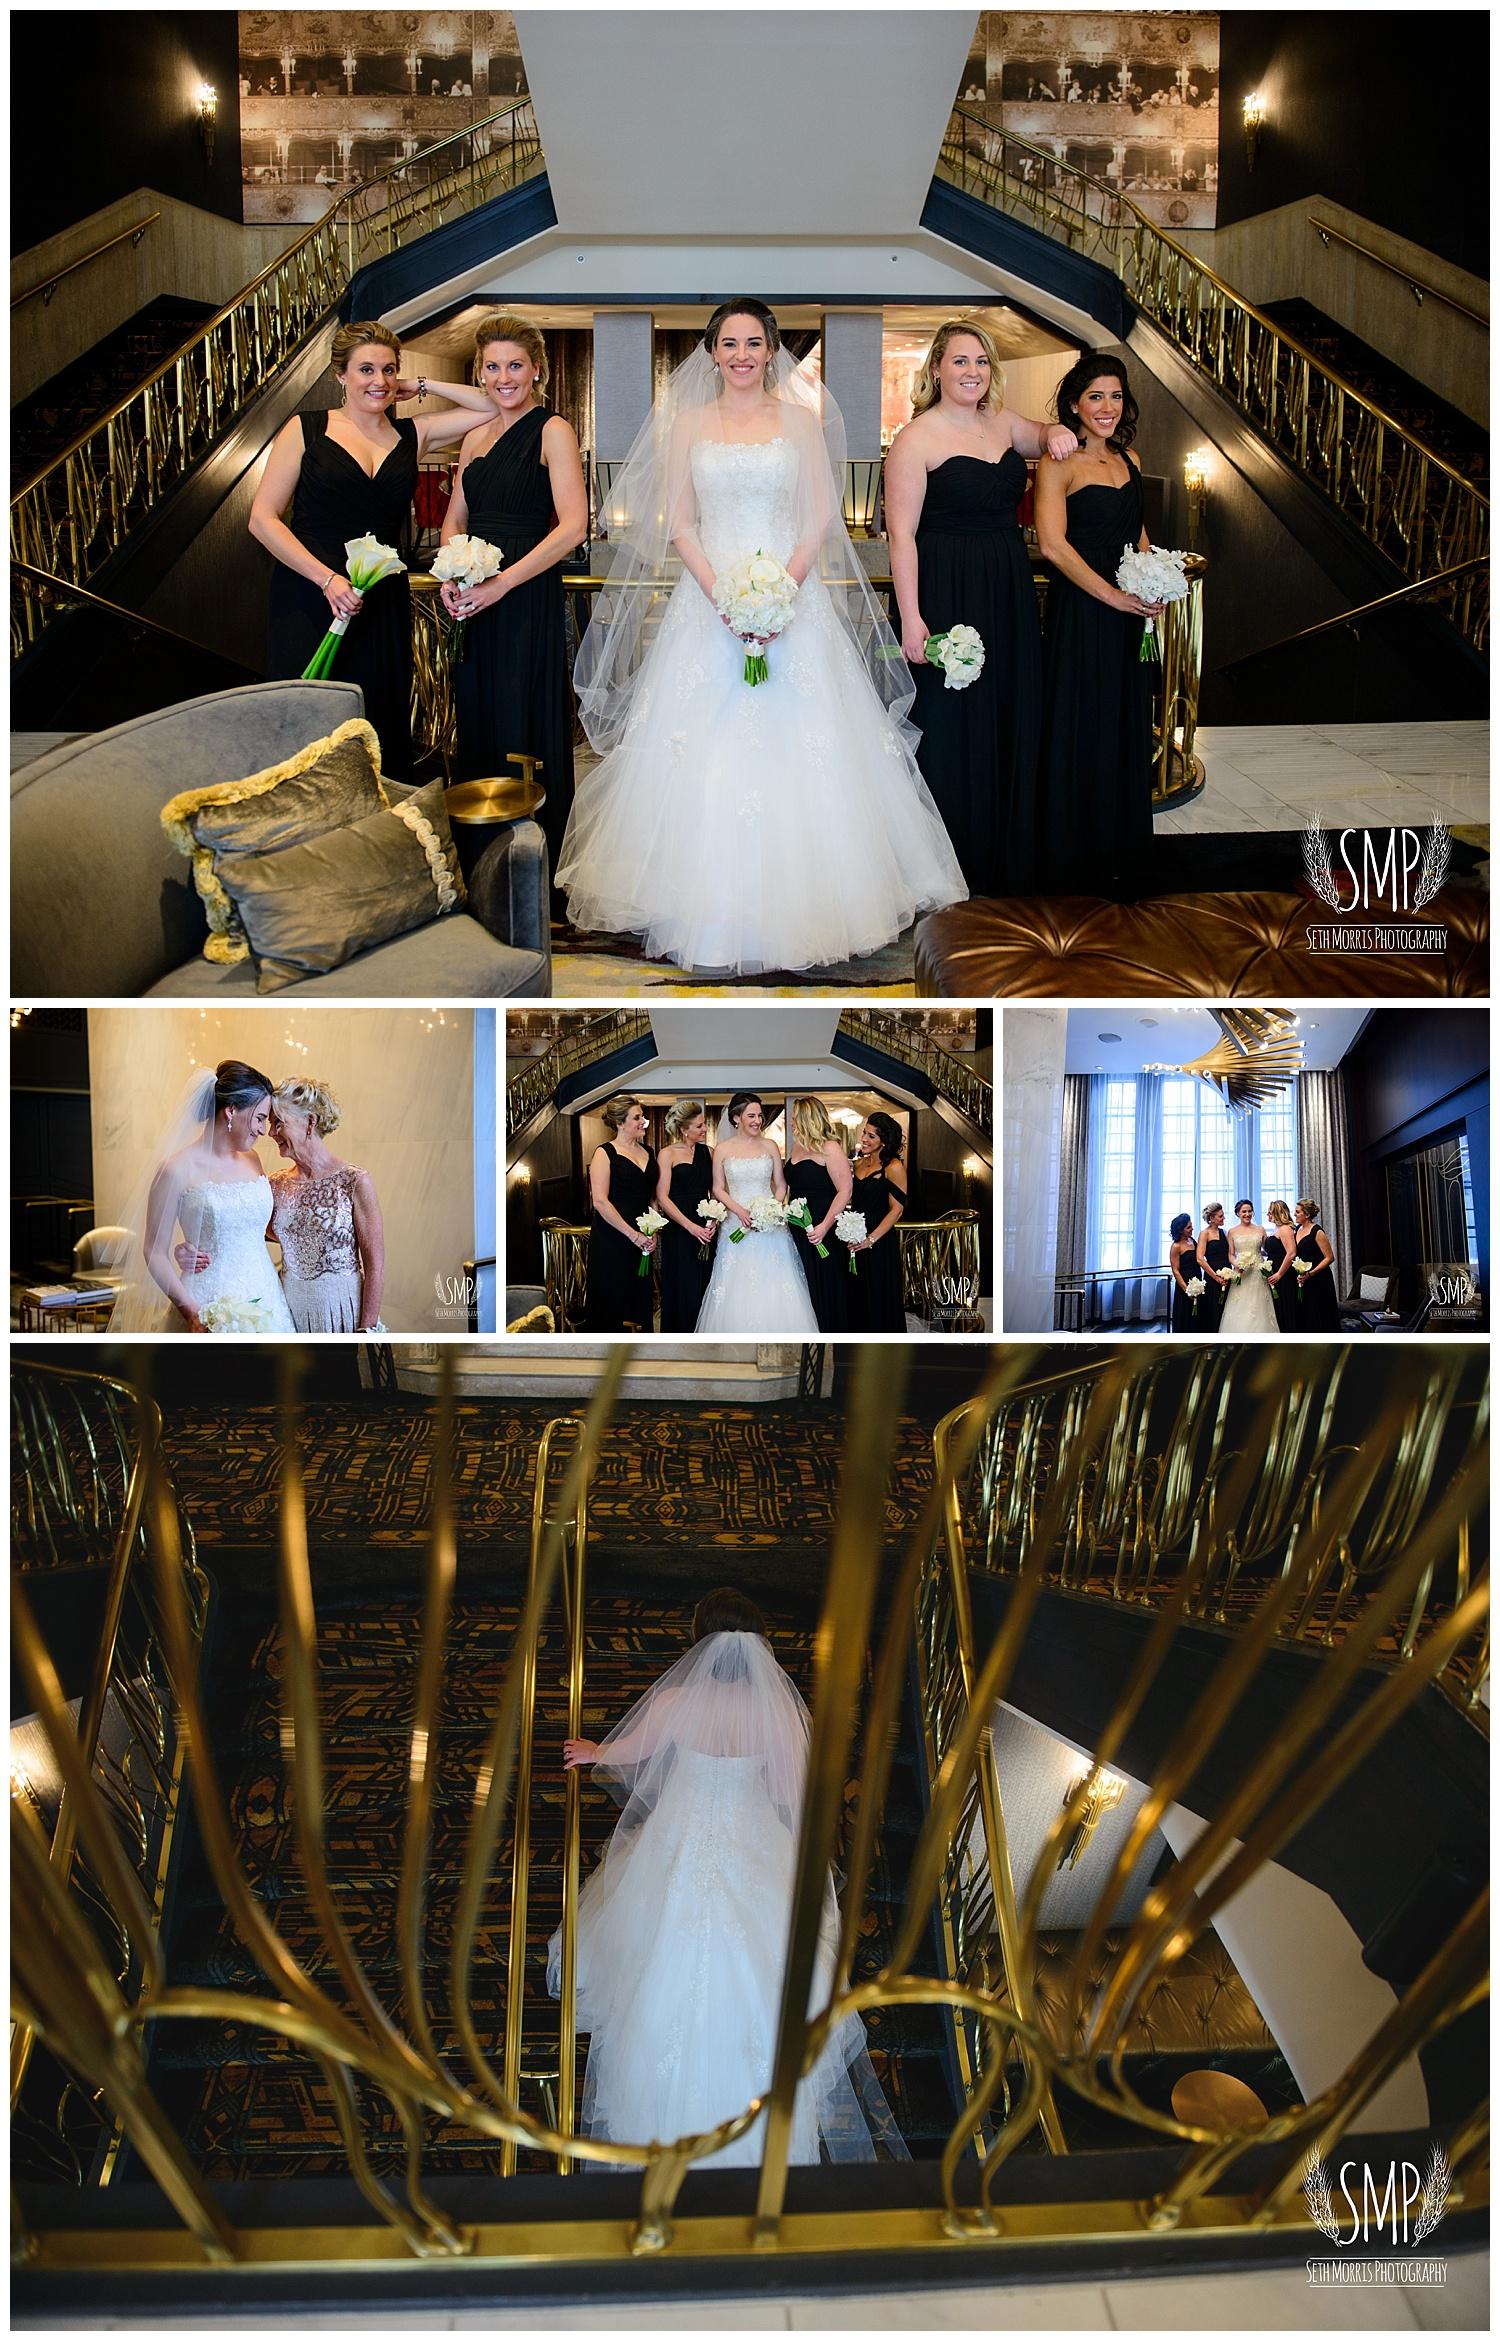 chicago-wedding-pictures-del-strada-hotel-allegro-31.jpg